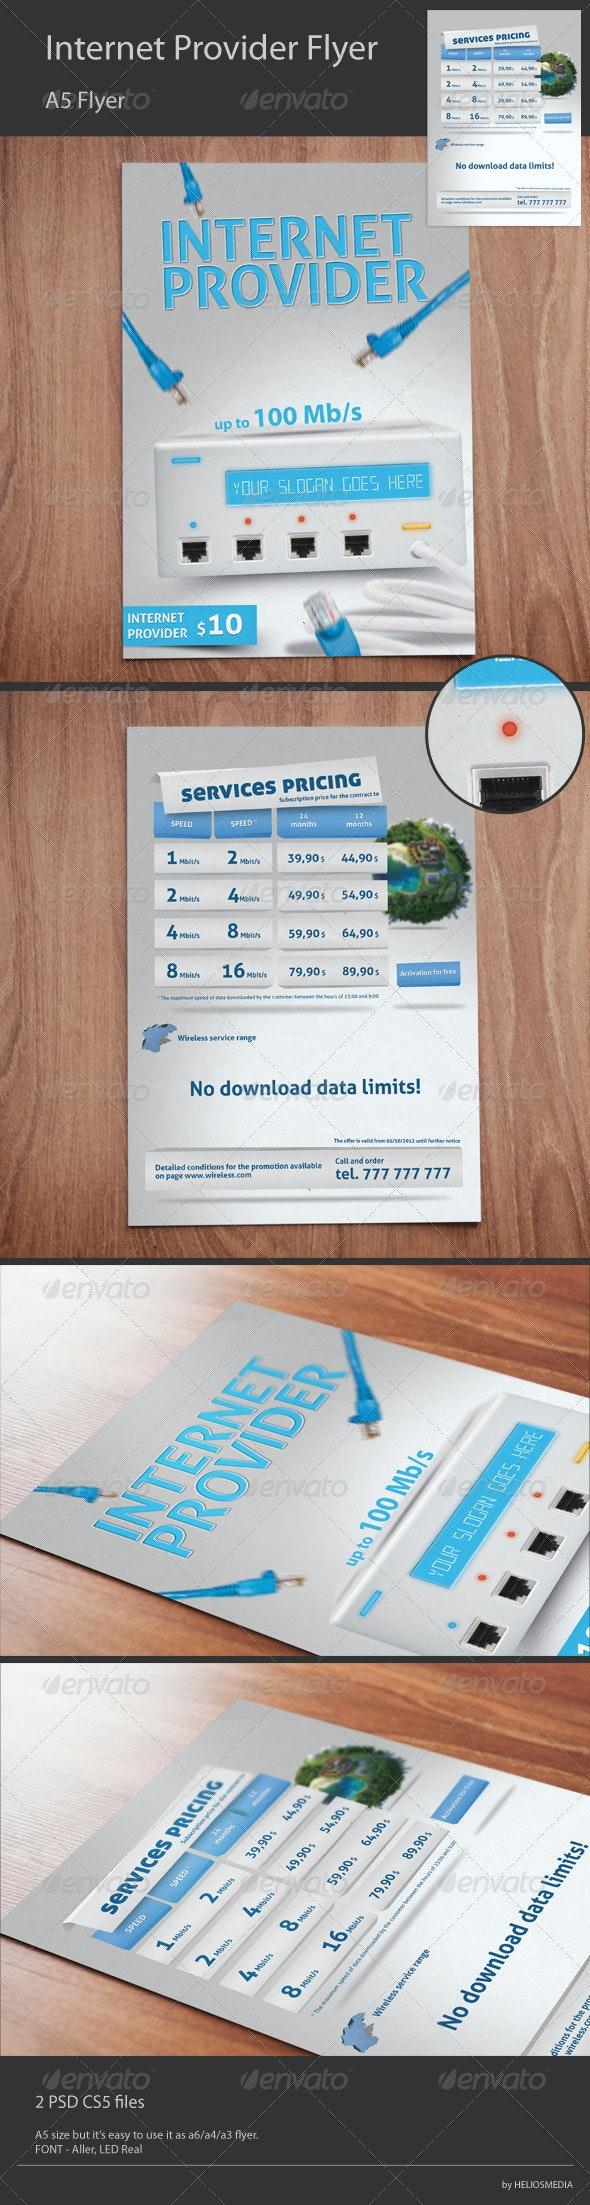 Wireless Internet Provider Flyer - Corporate Flyers